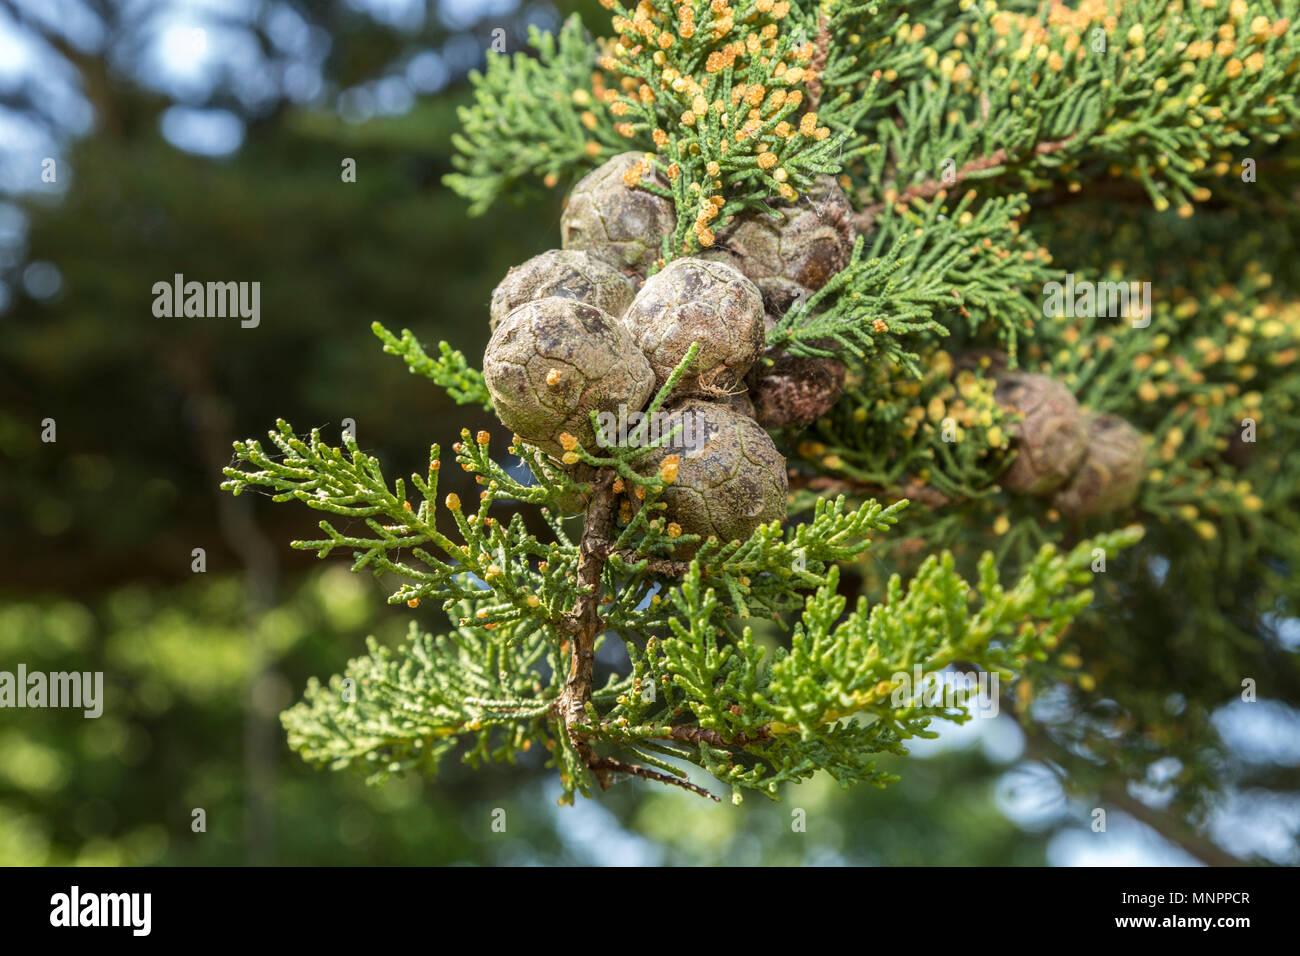 Monterey cypress (Cupressus macrocarpa) cones,reproductive  fruit of the tree - Stock Image